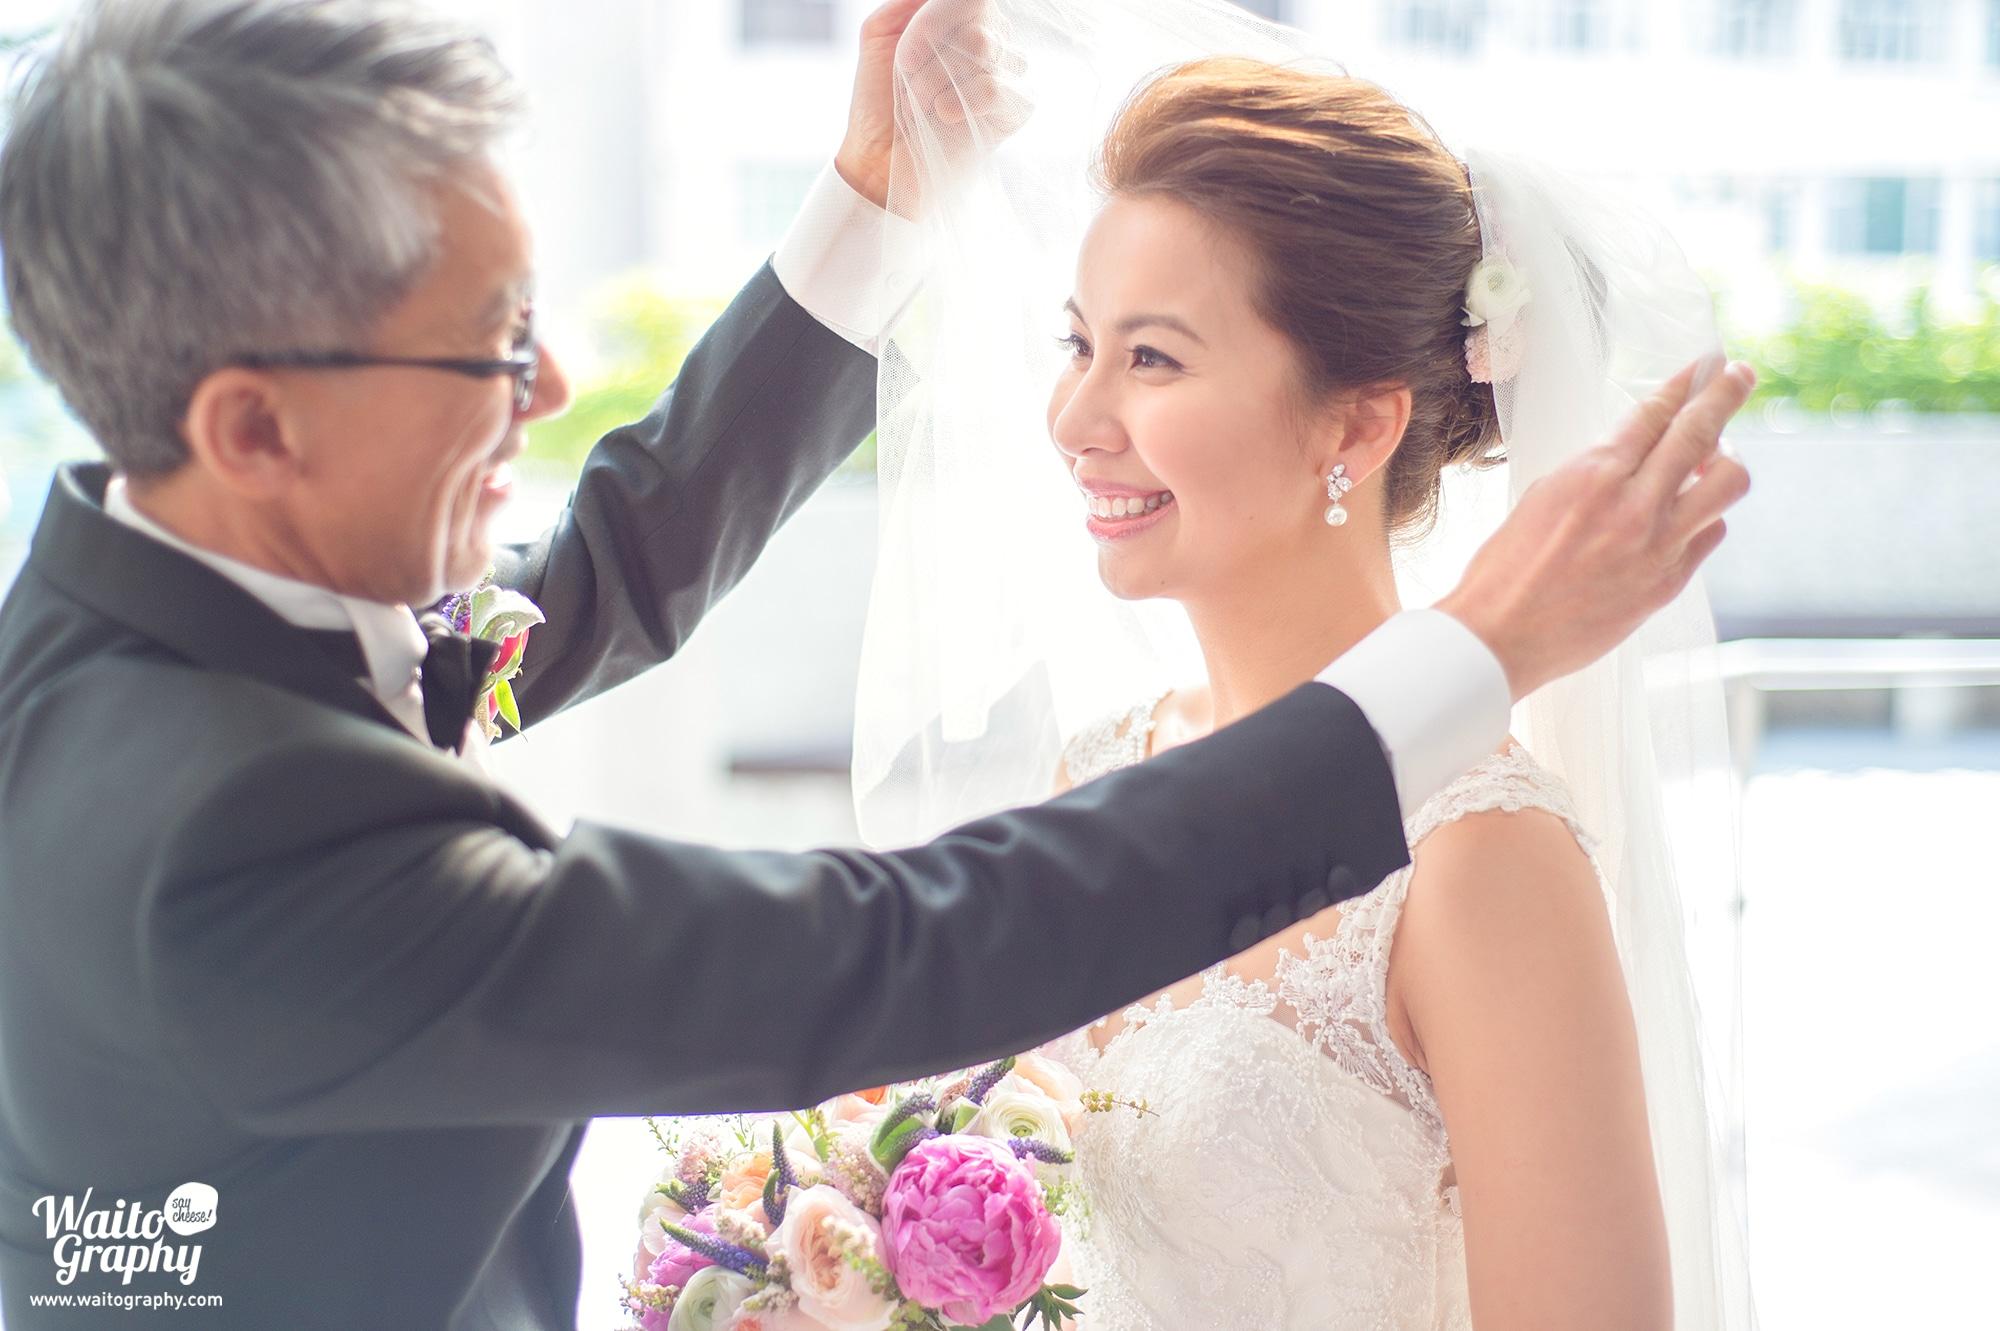 在聖瑪加利大堂舉行婚禮 Janice and Lambert Wedding Day HK at St. Margaret's Church